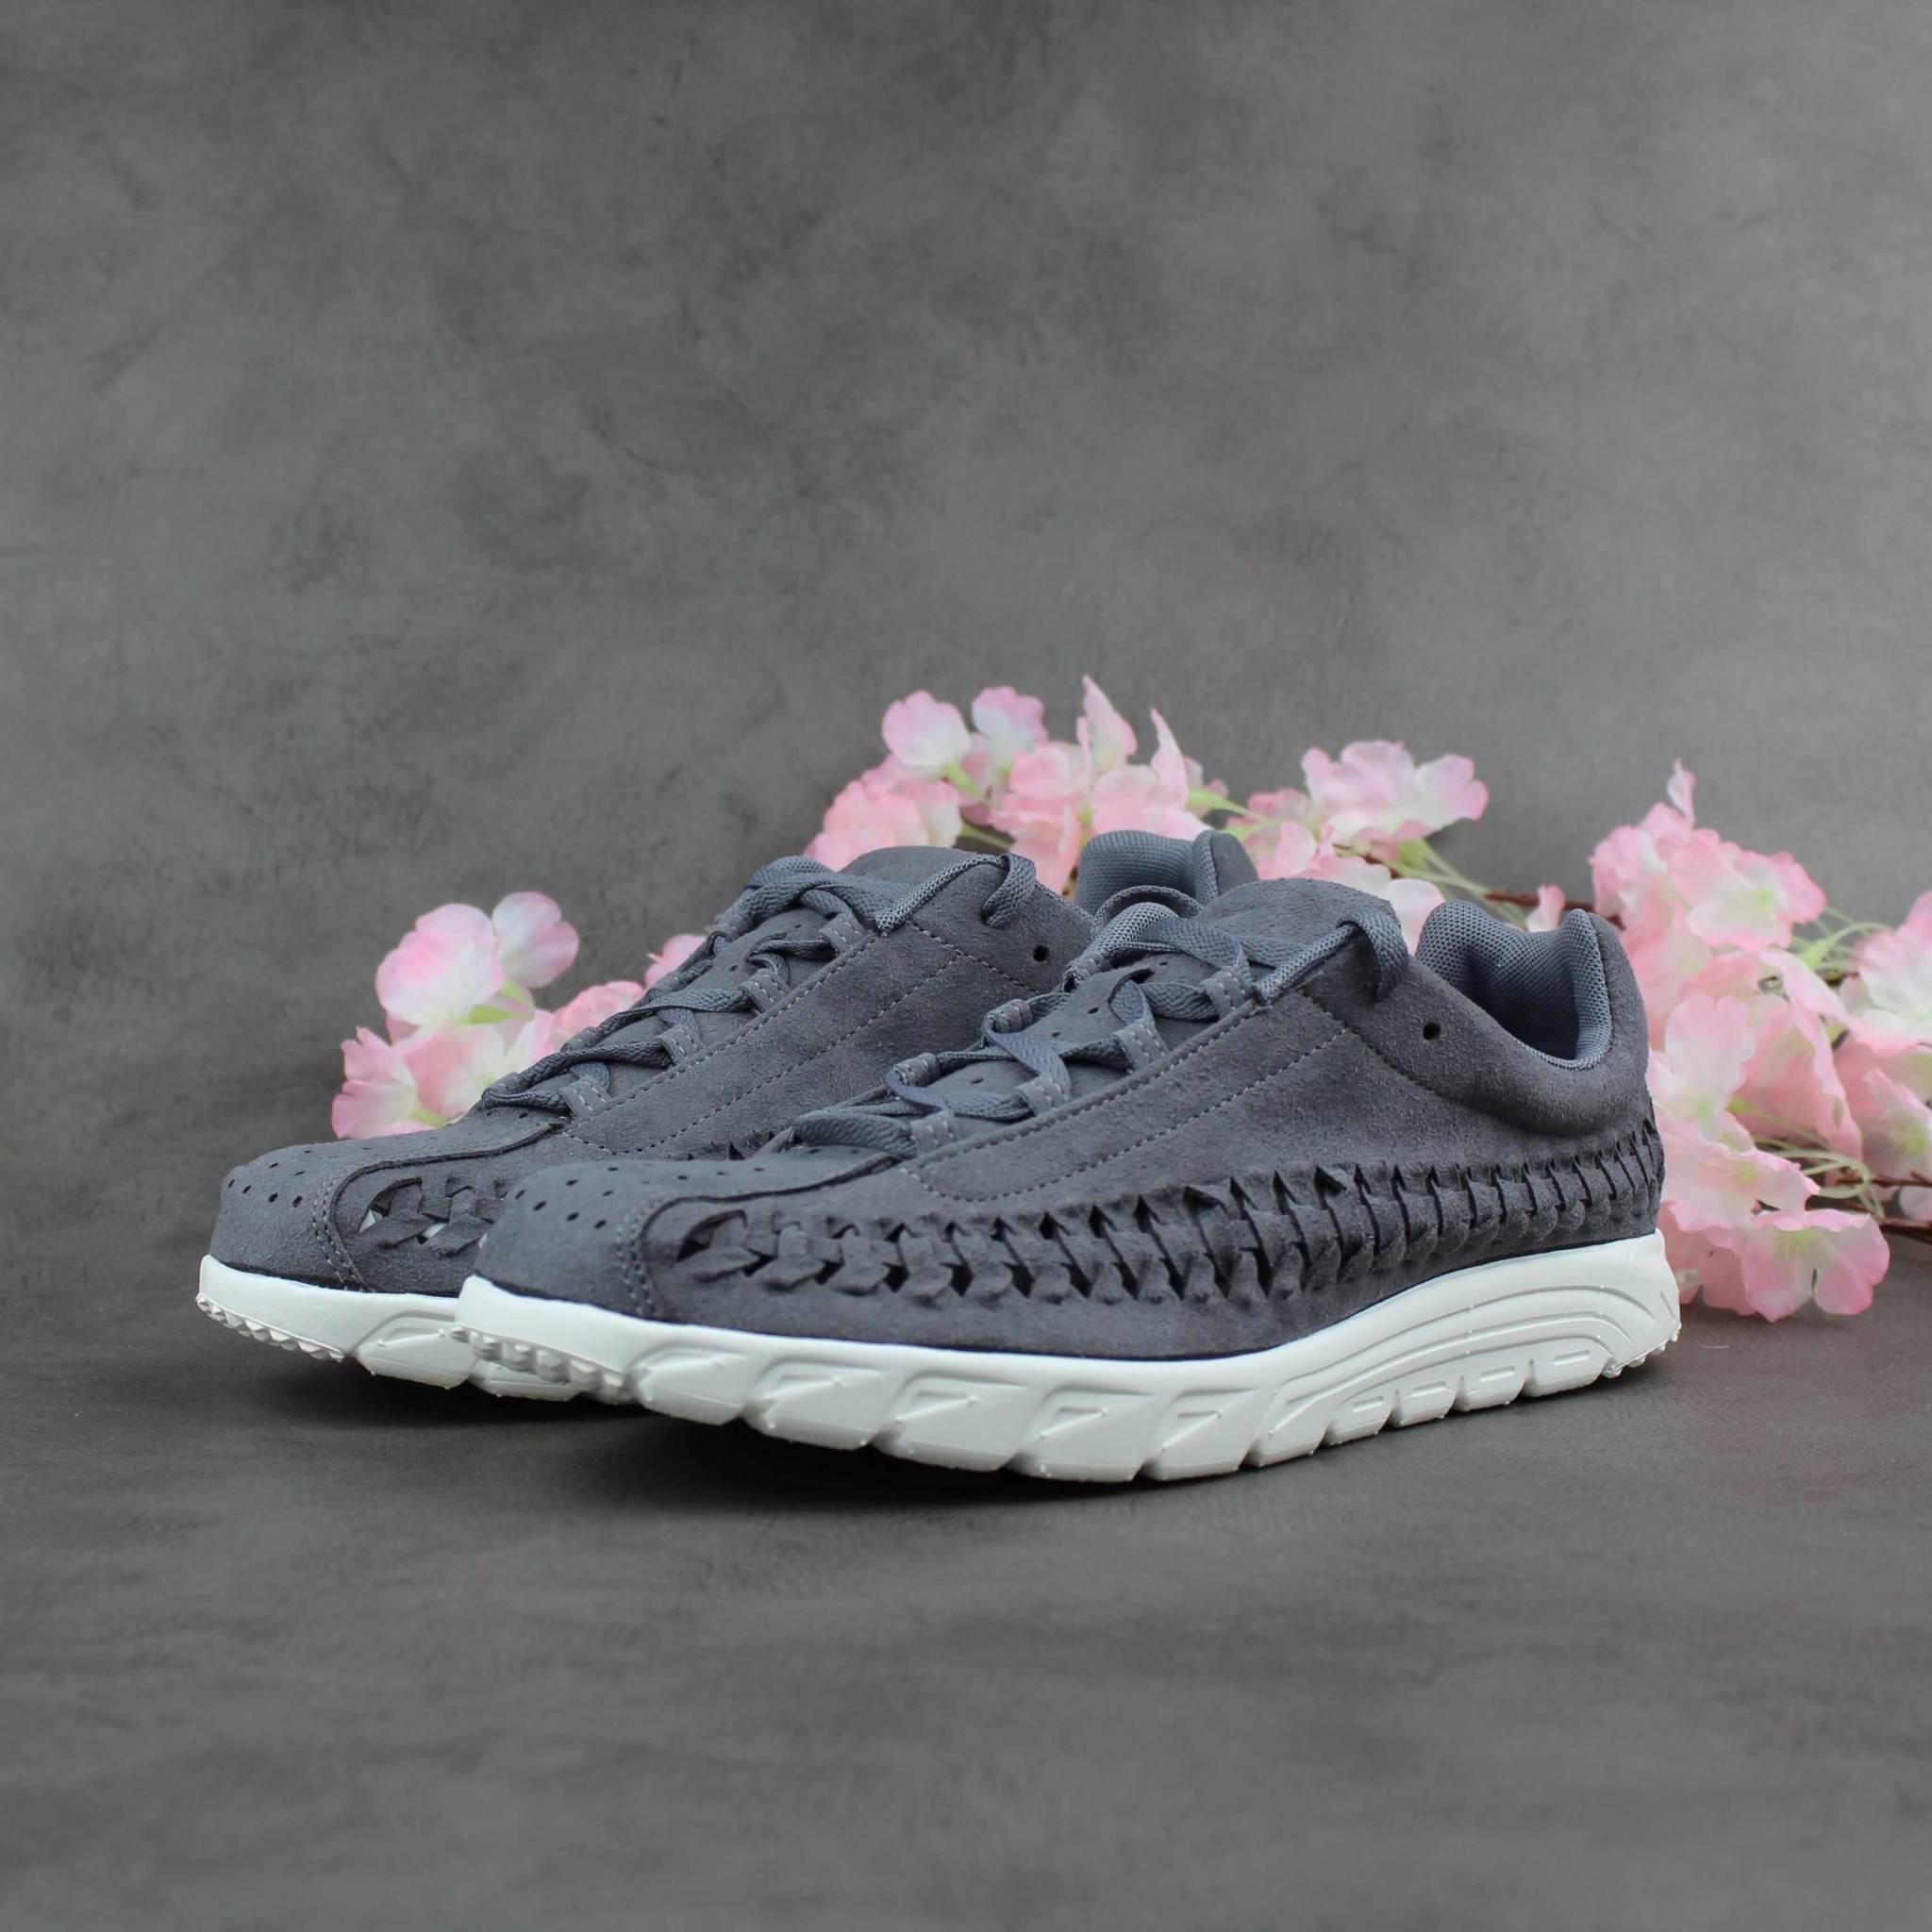 Nike MayFly Woven (Gunsmoke) 833132-007